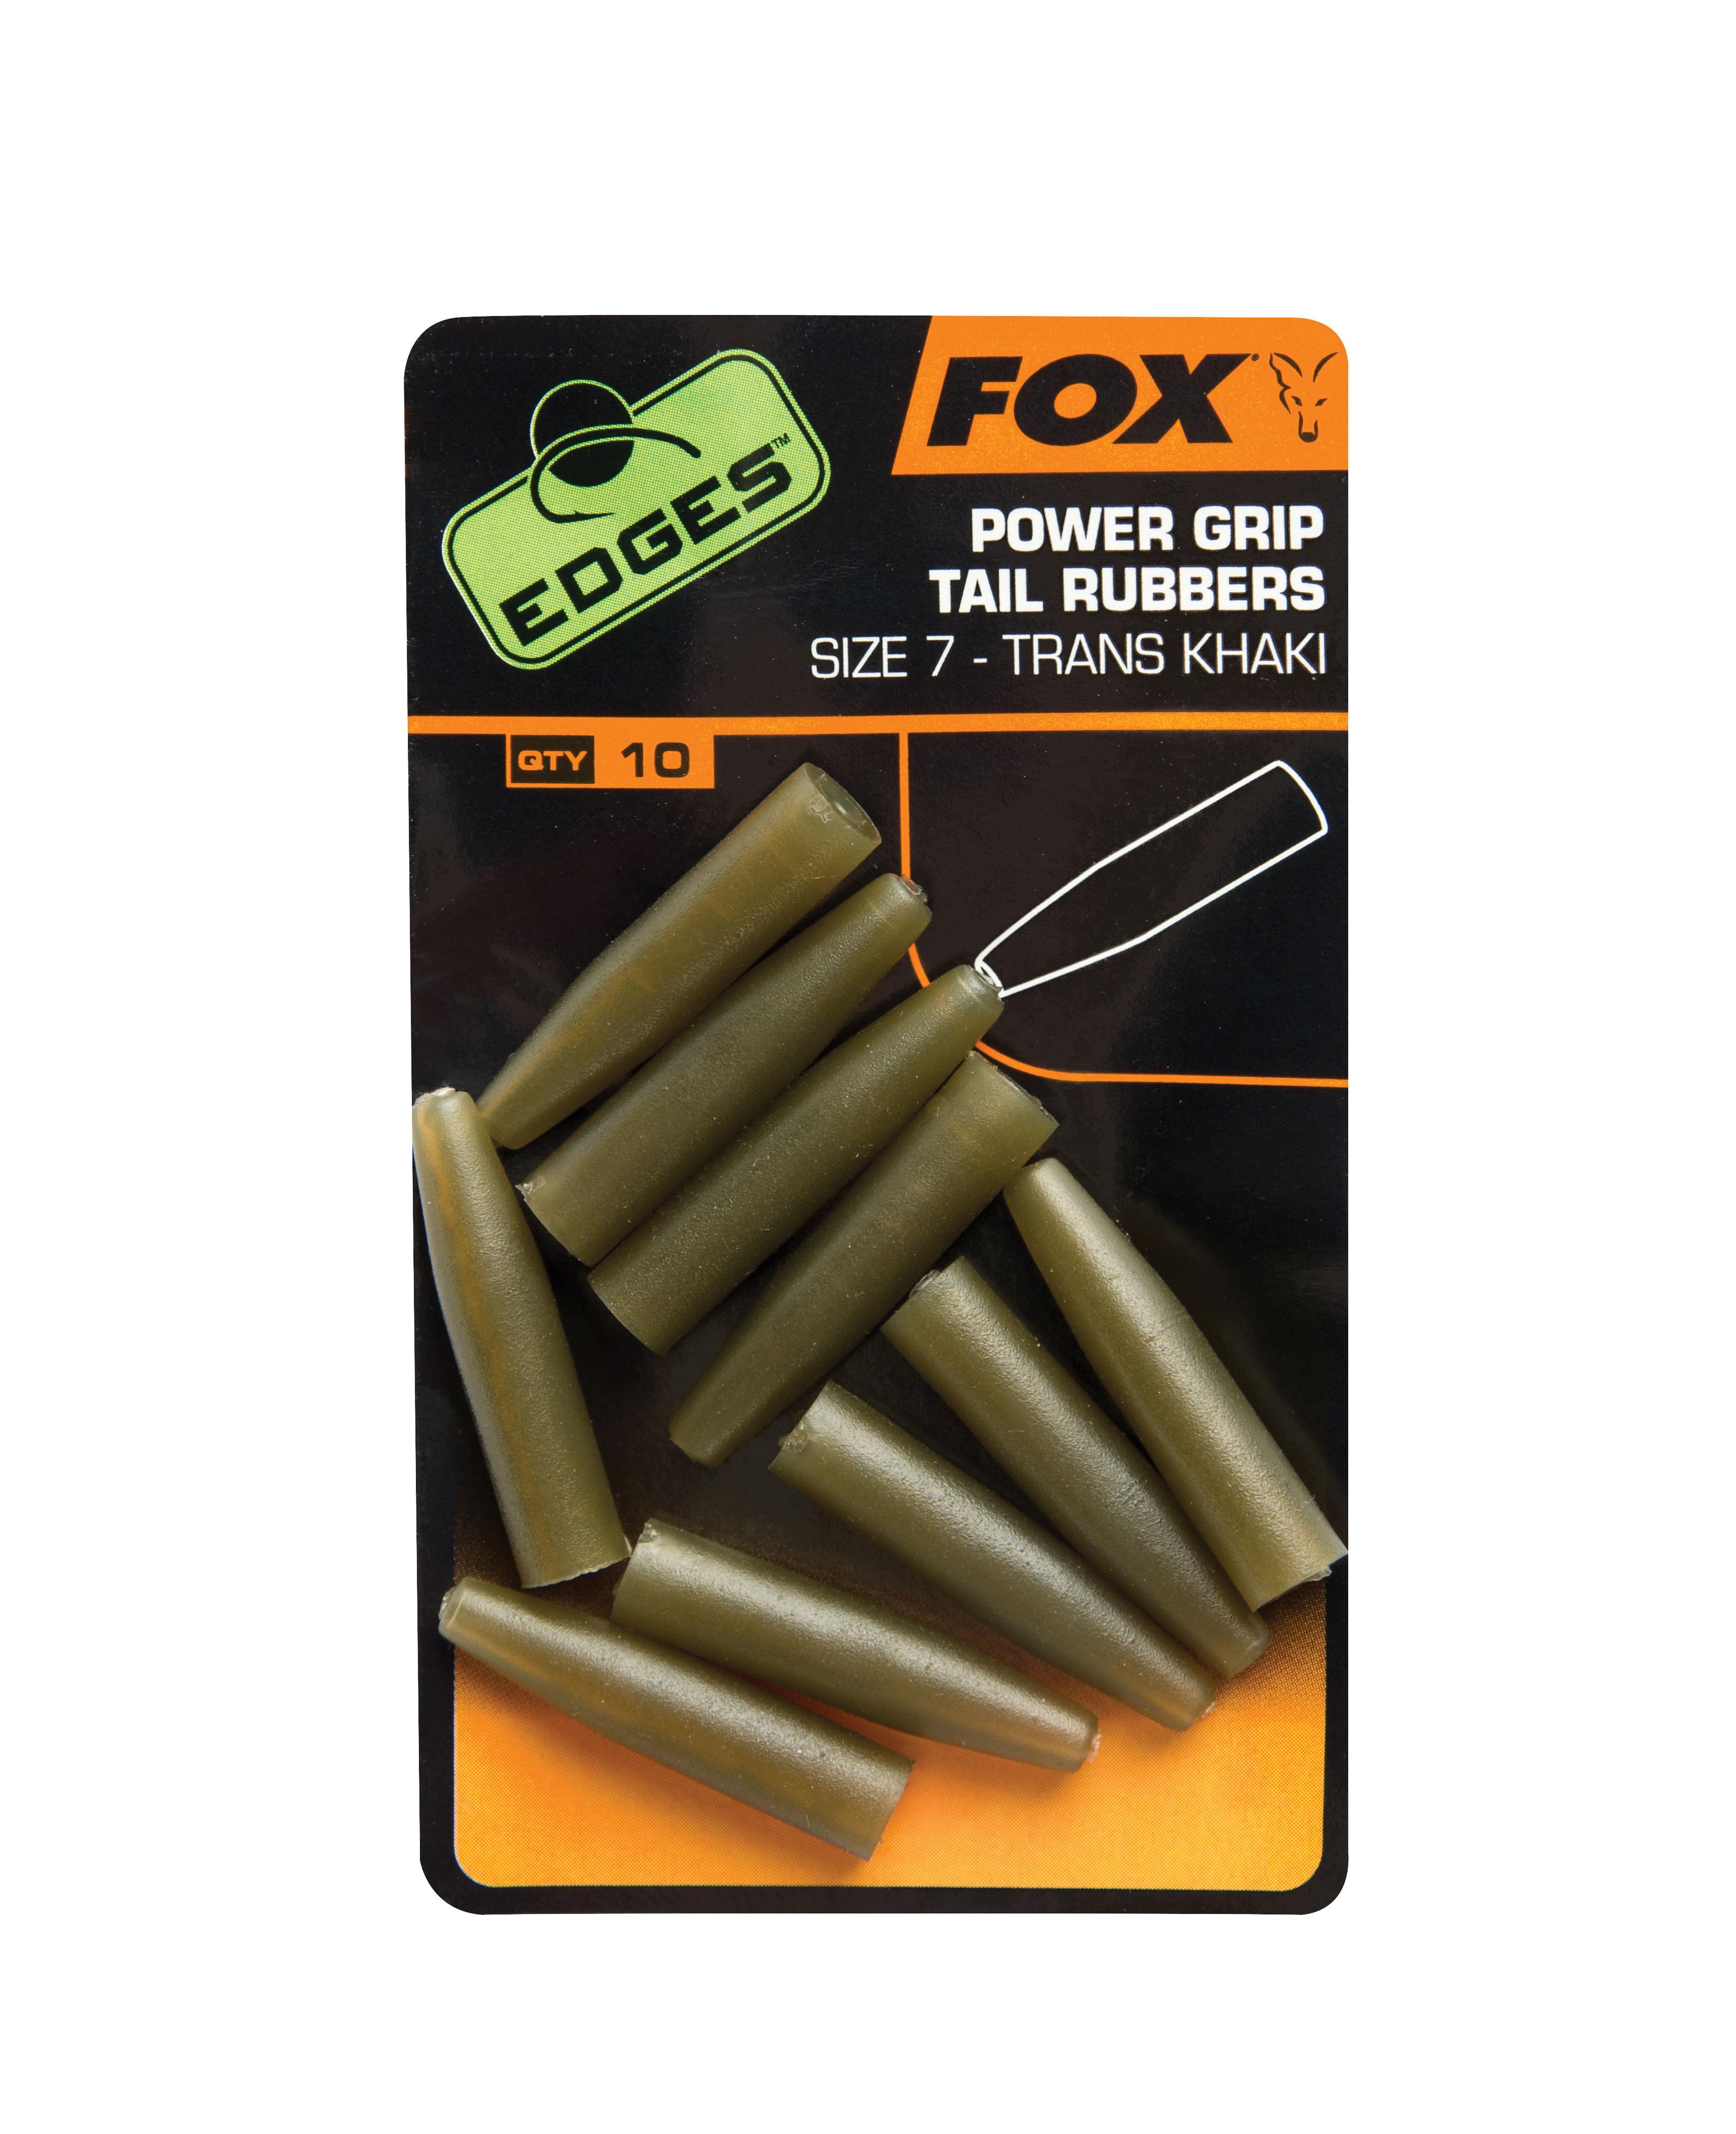 Fox Power Grip Tail Rubbers Št: 7